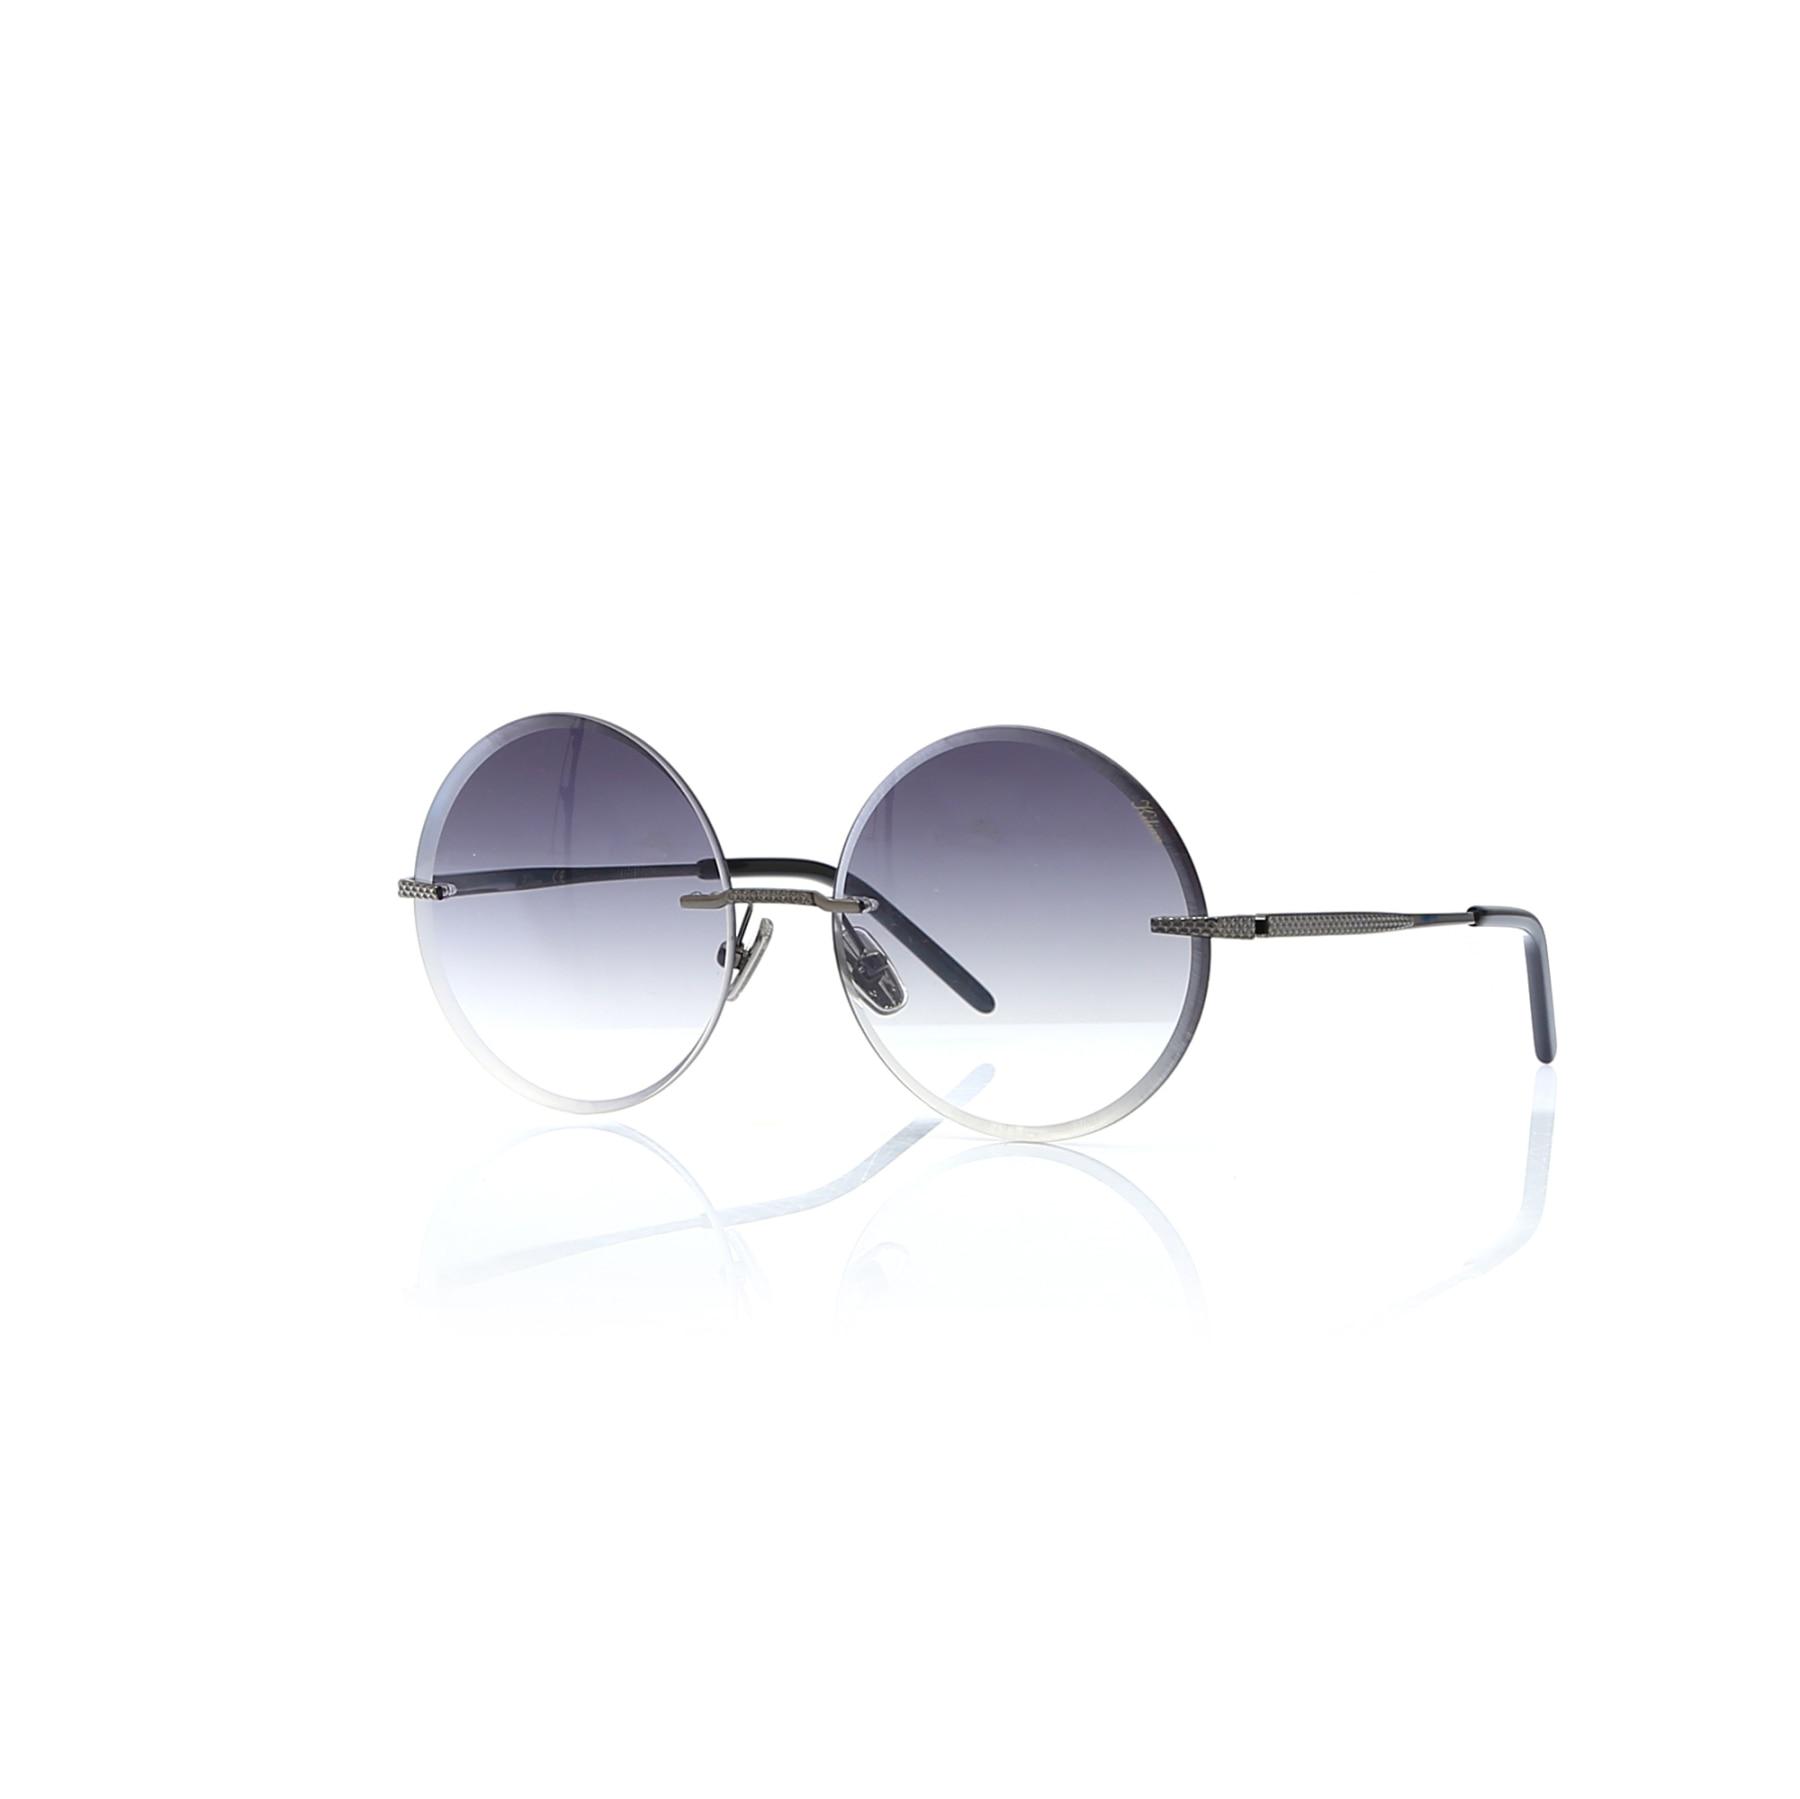 Gafas de sol para mujer k 8128 01 metal plateado orgánico redondo 59-17-143 kilian